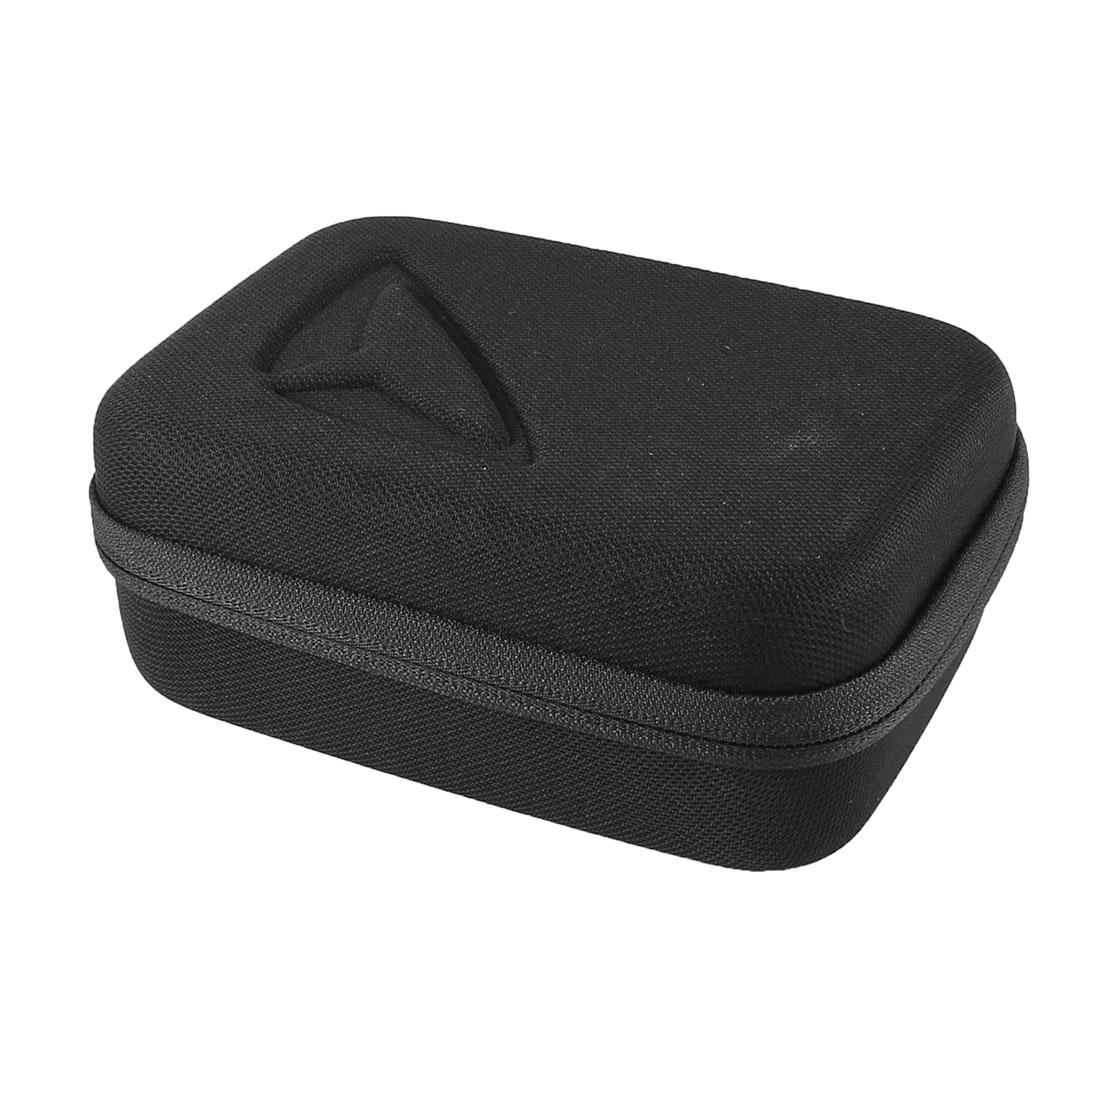 Zipper Closure Protective Anti-Shock Carry Carrying Case EVA Storage Bag Black for Digital DSLR SLR Camara